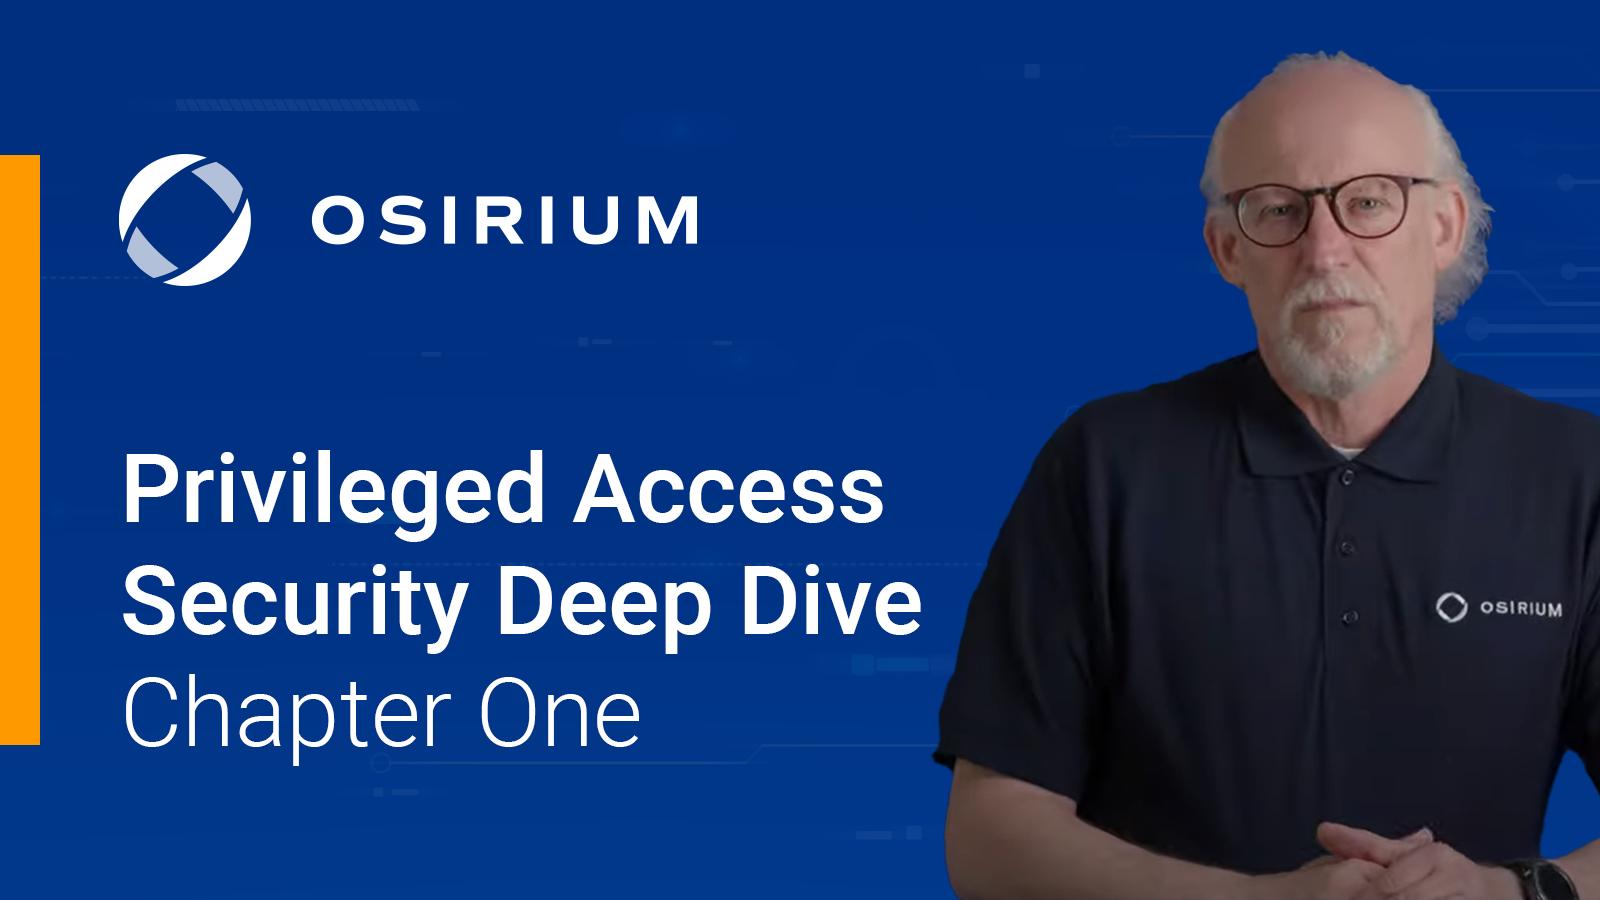 Privileged Access Security - A Deeper Dive